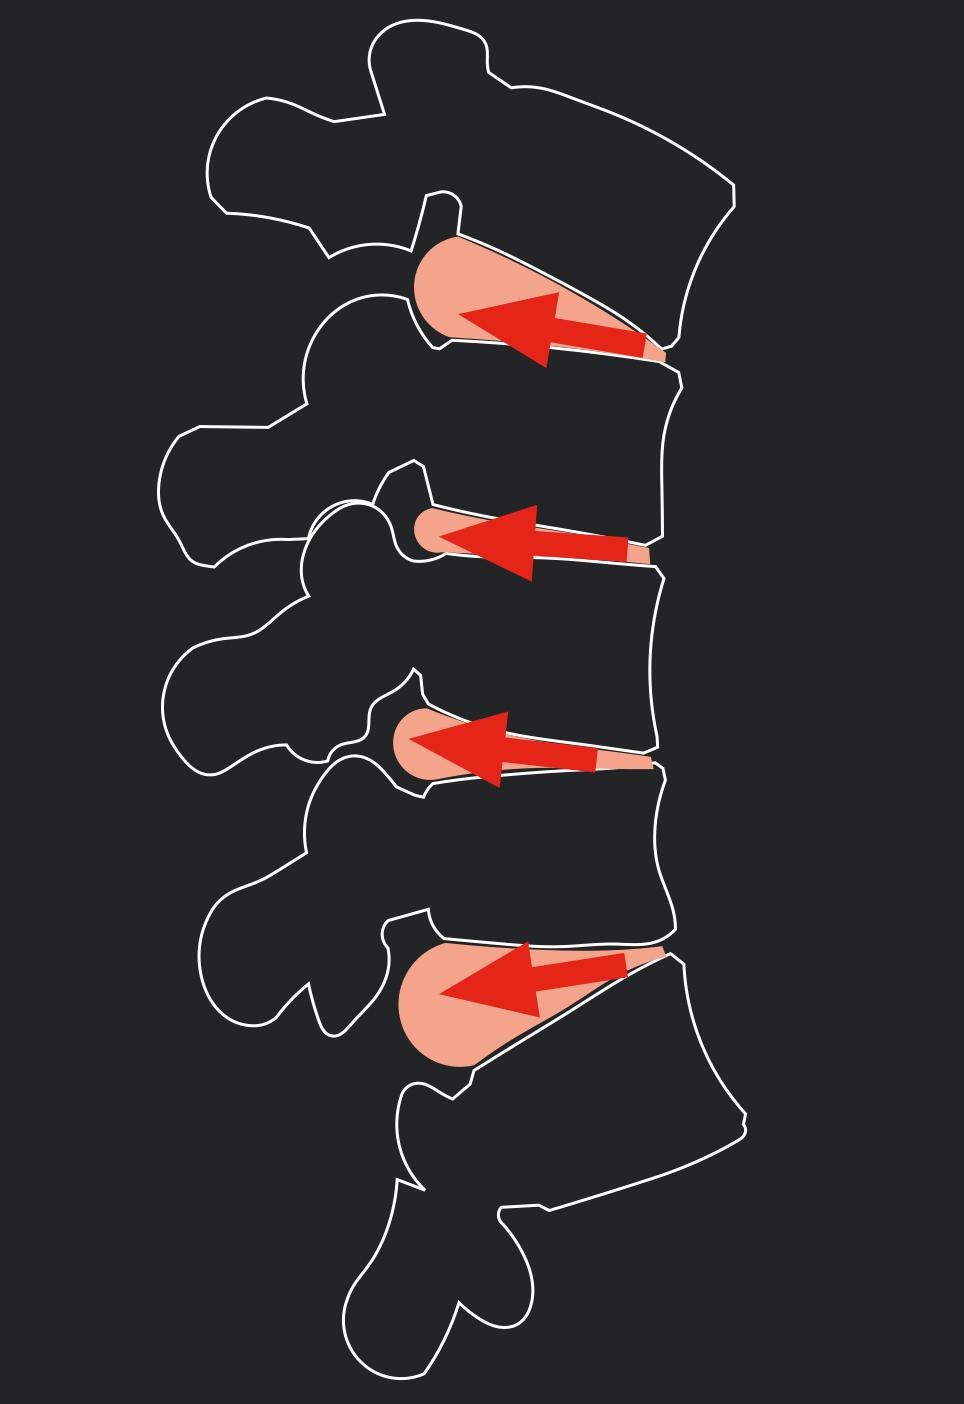 Flexed spine